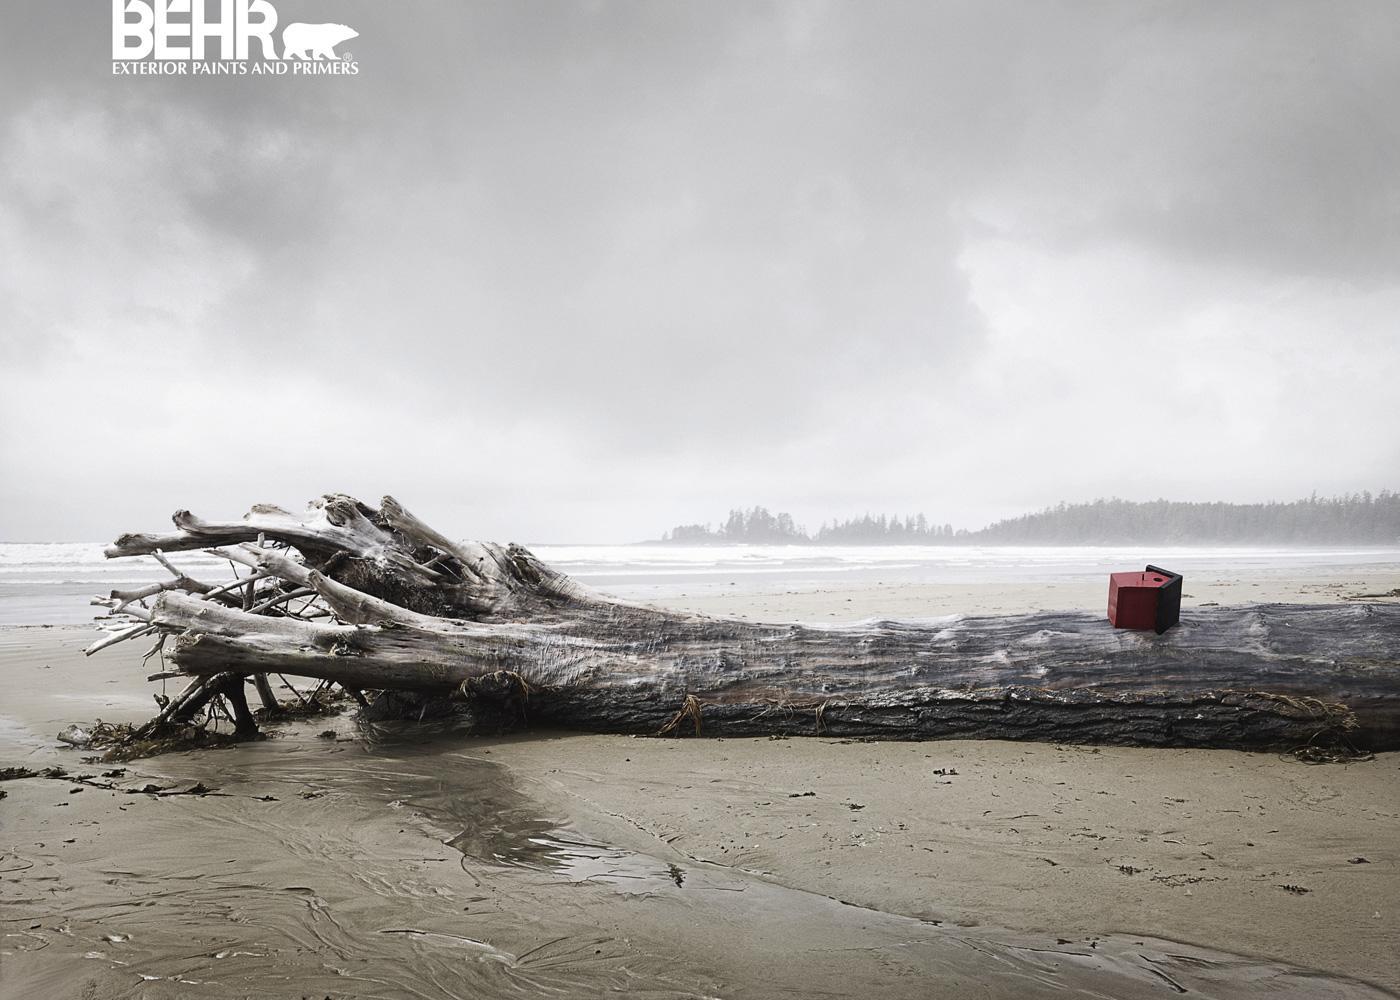 Behr Print Ad   Driftwood